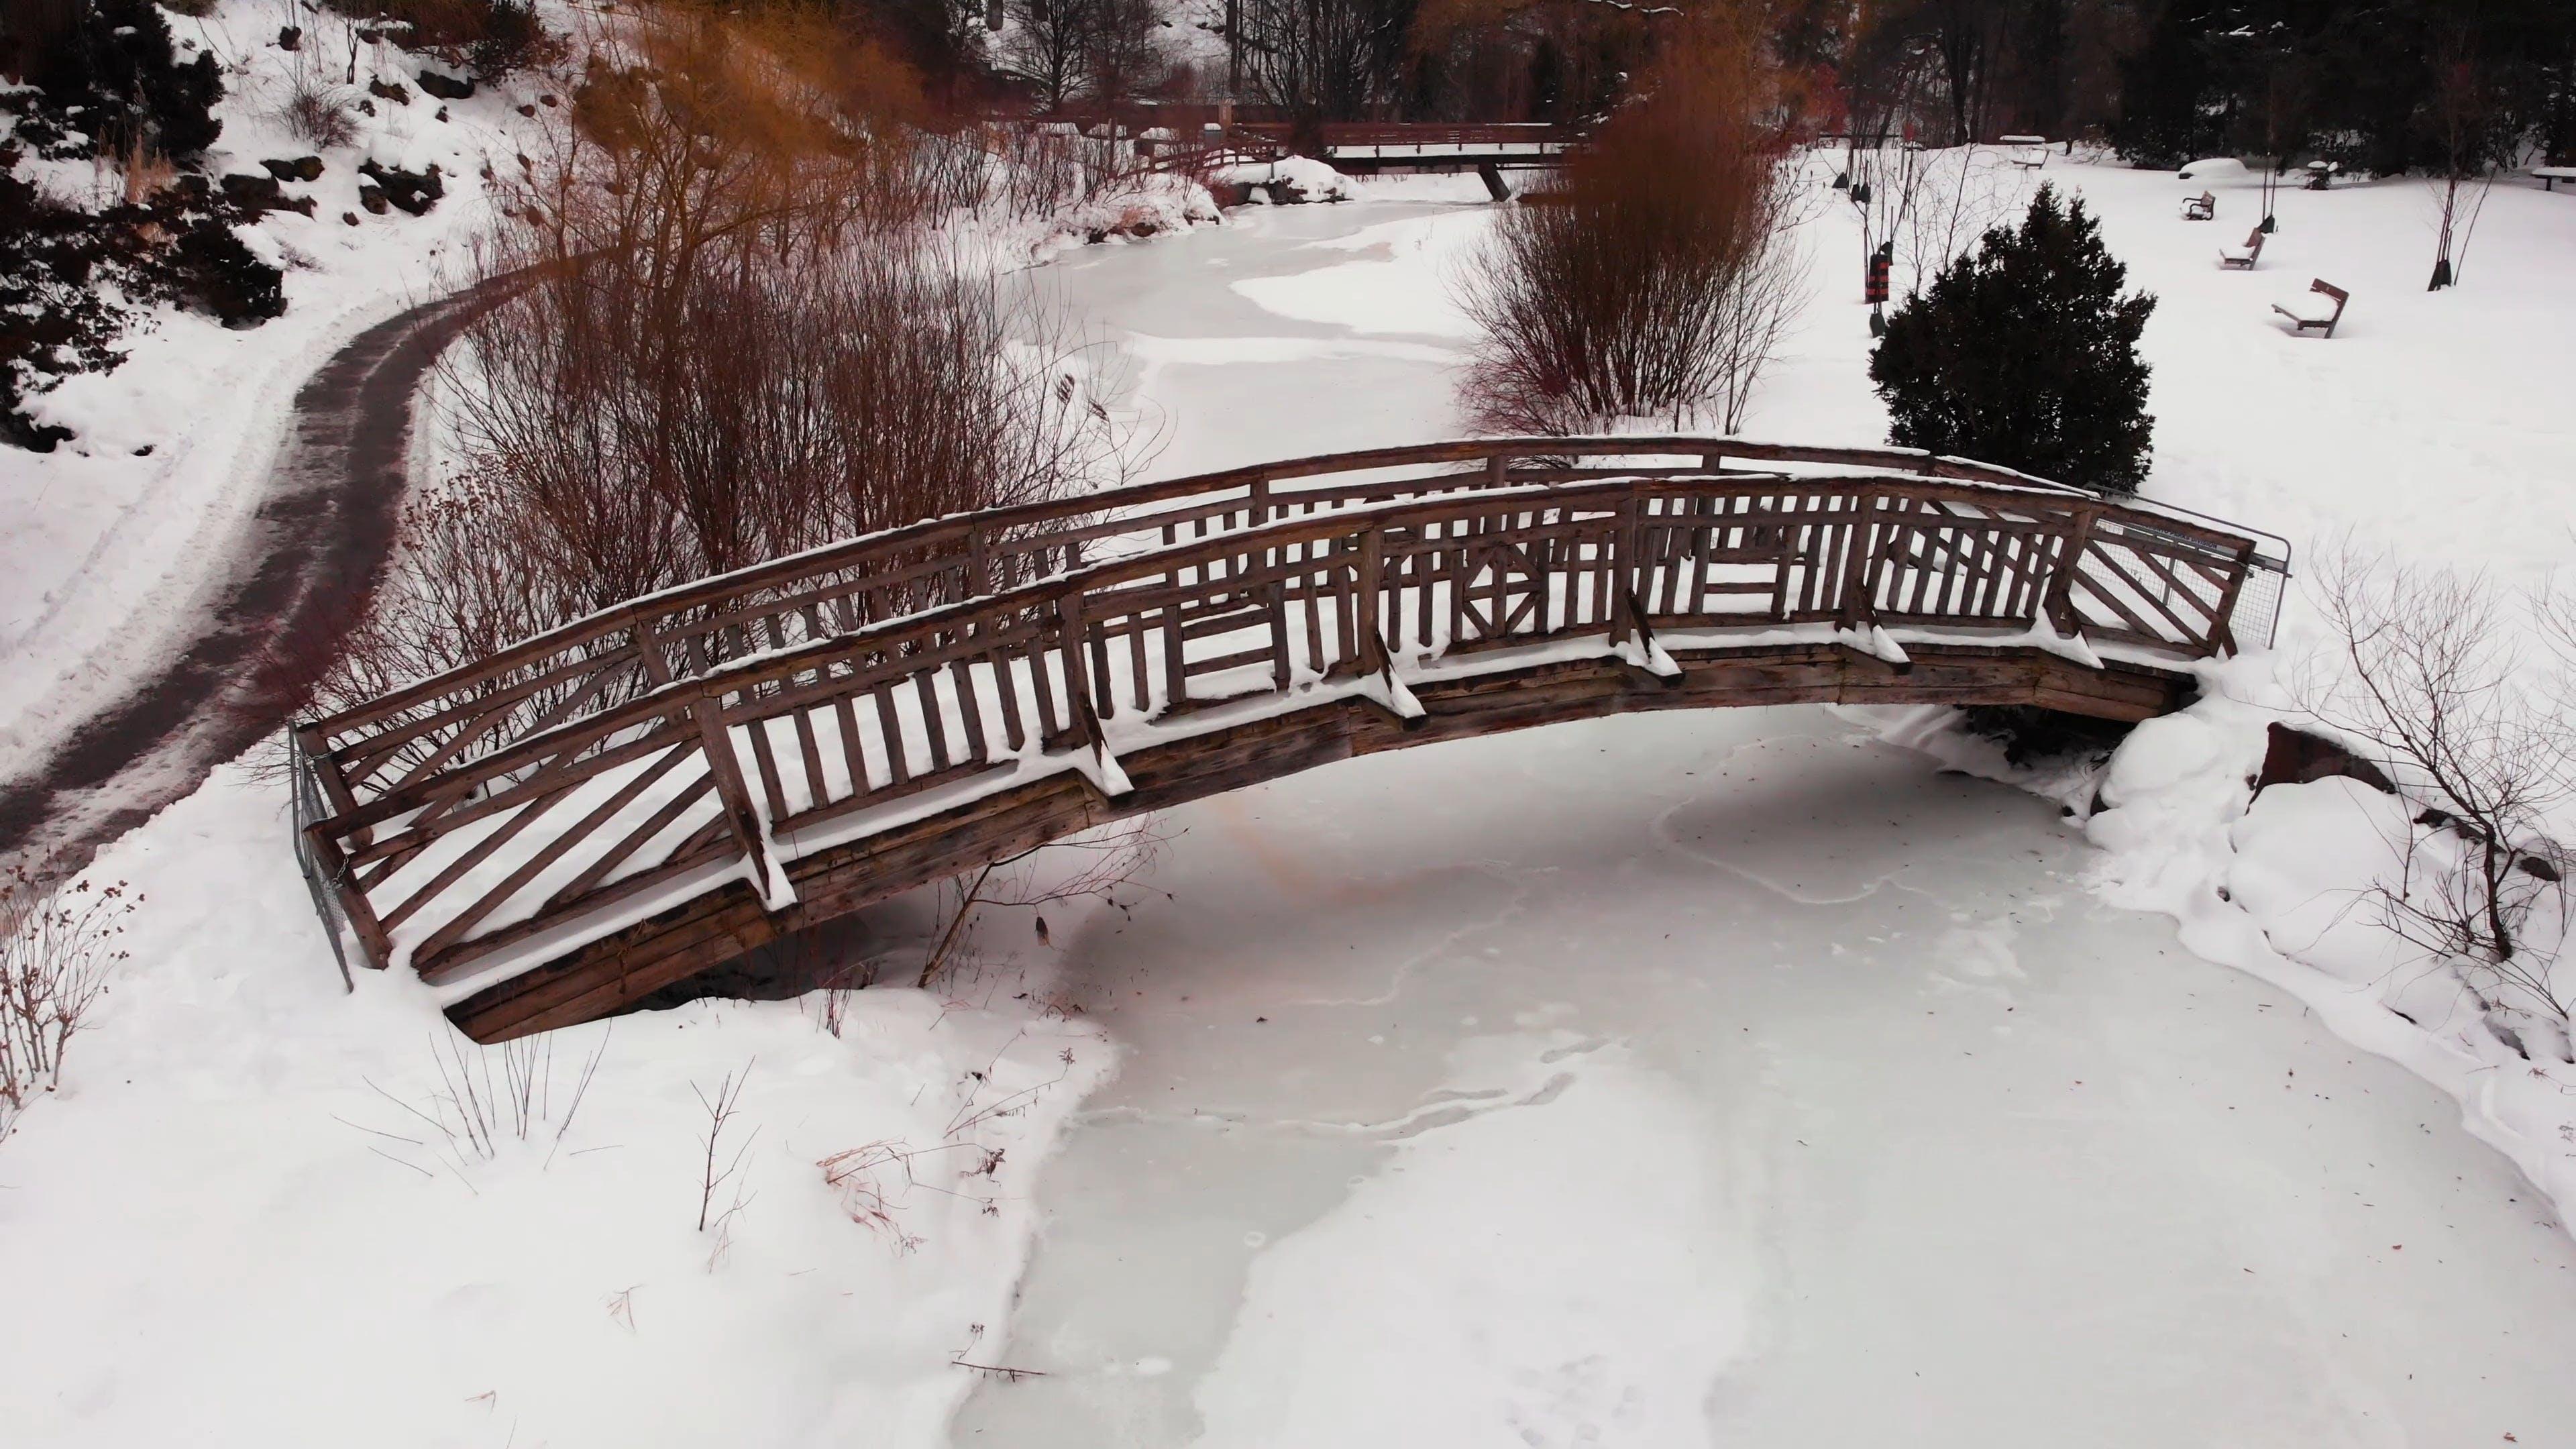 A Snow Covered Park